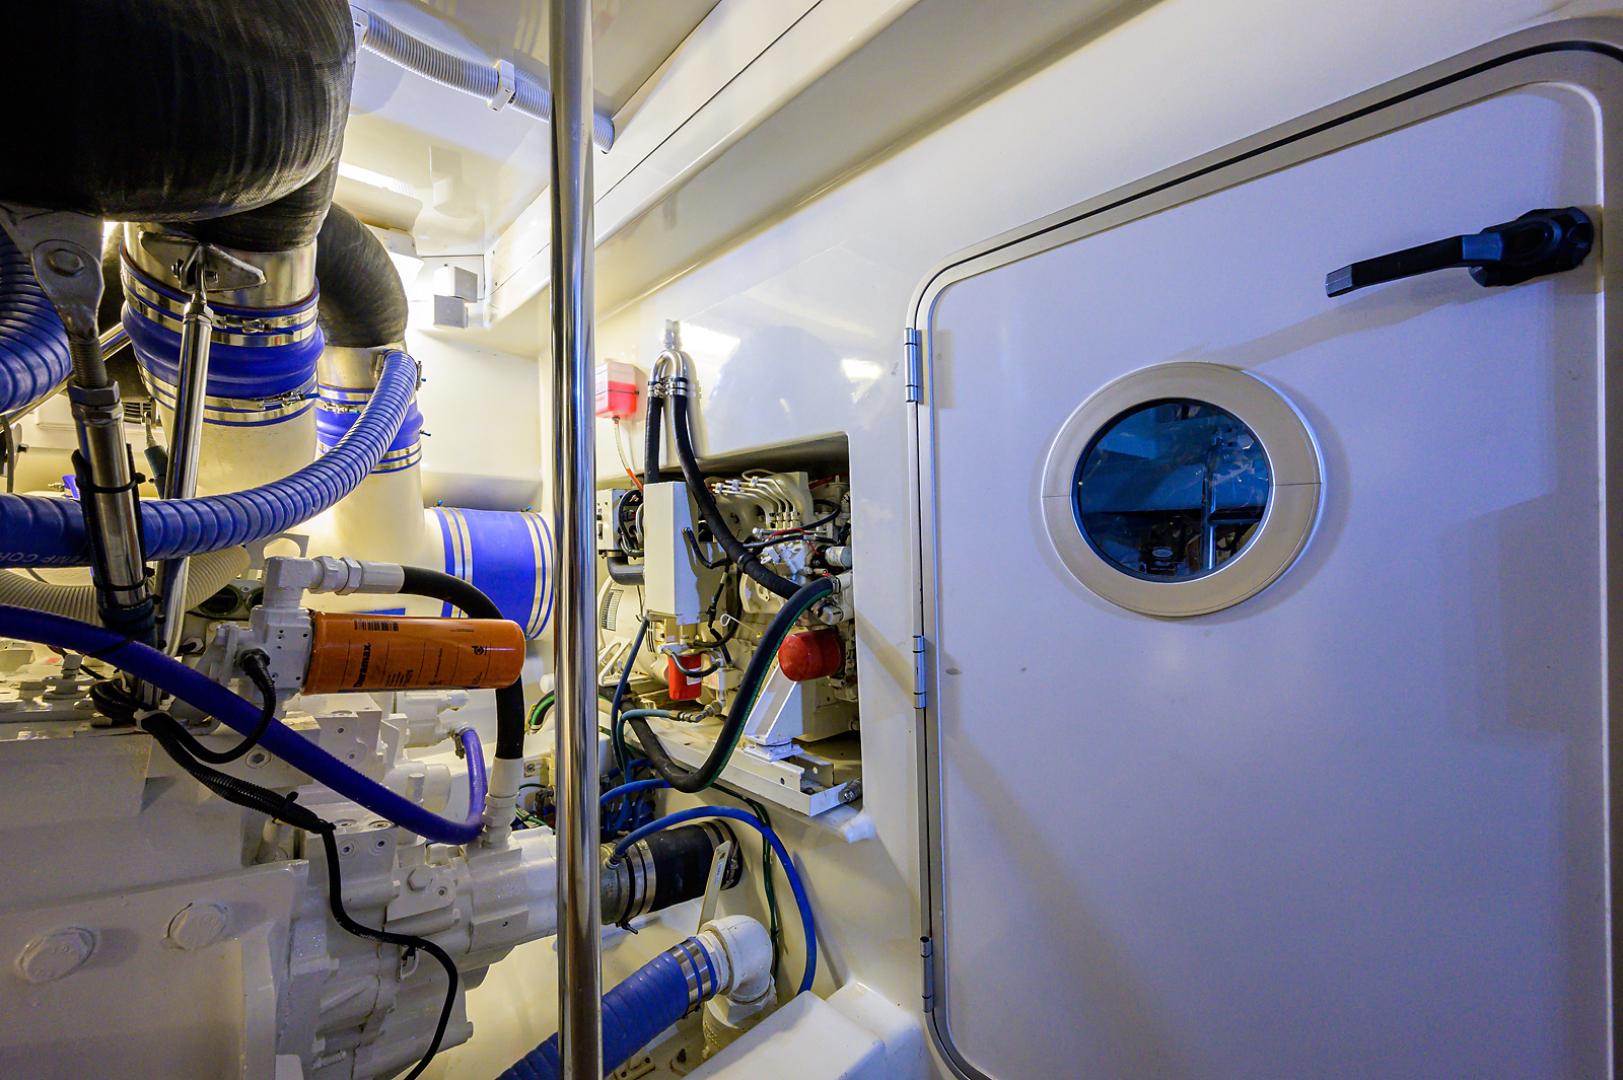 Titan-Convertible 2015-OVER RIDE PALM BEACH GARDENS-Florida-United States-Engine Room-1562377 | Thumbnail